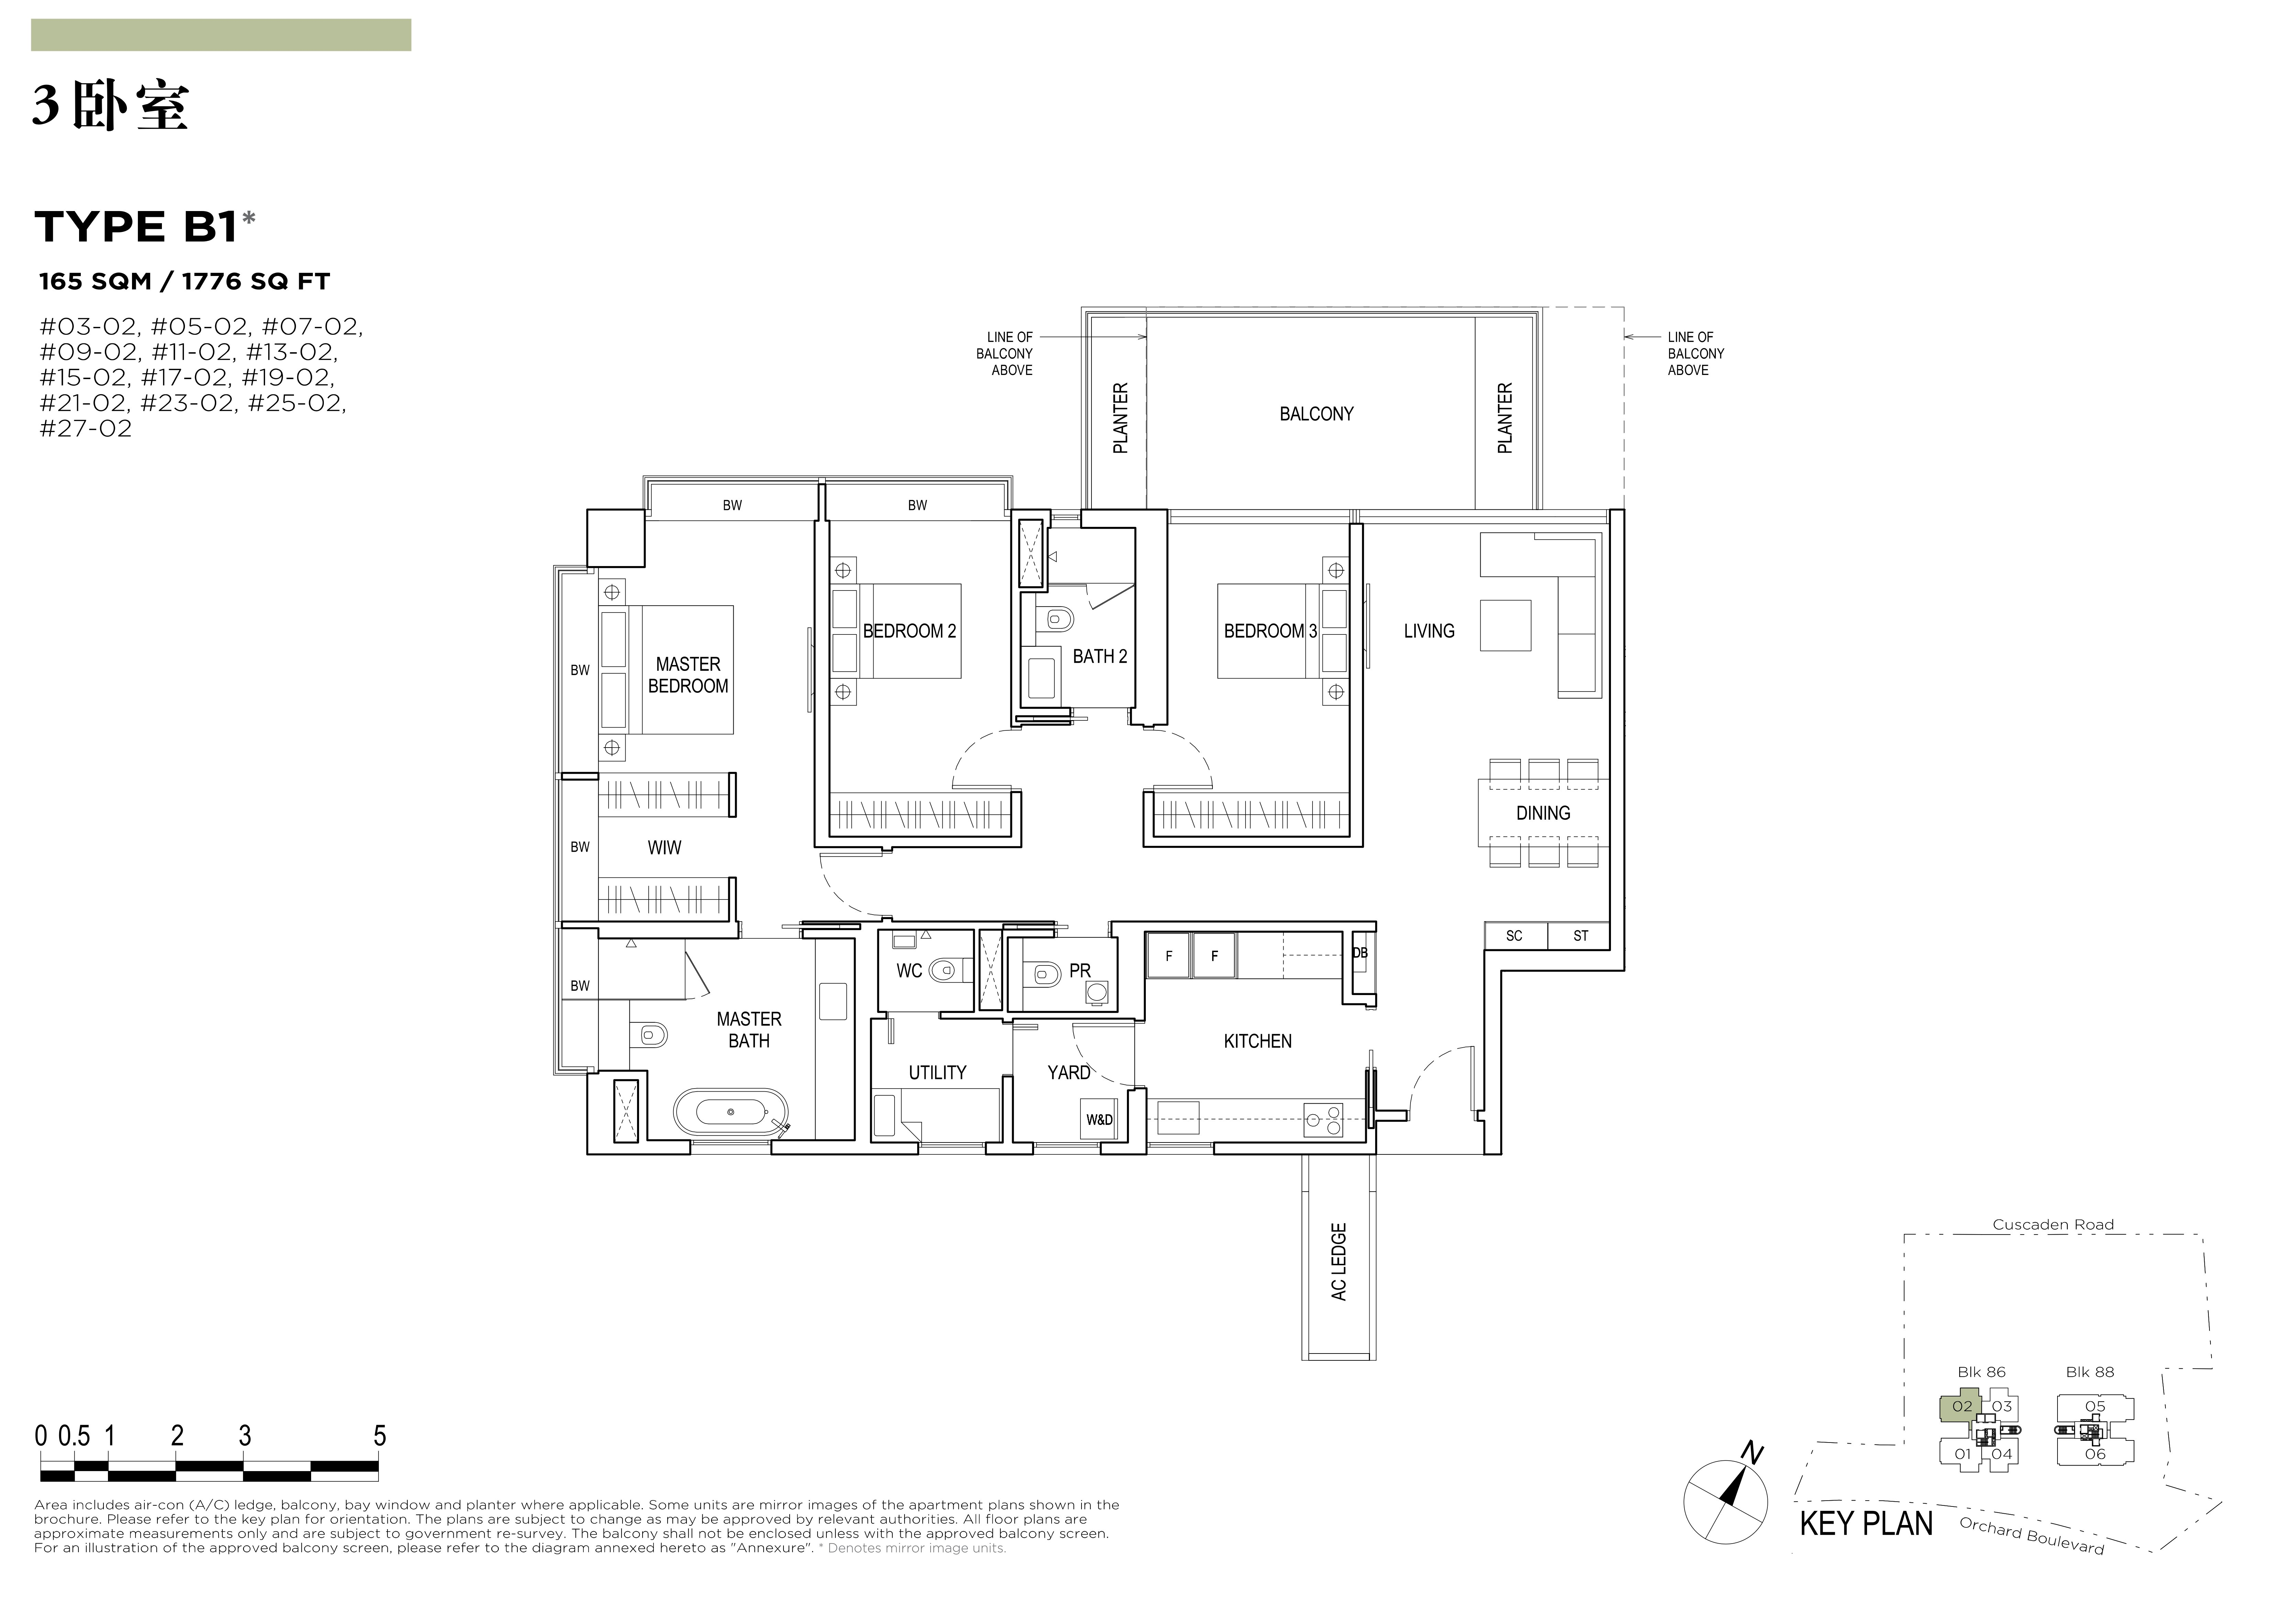 铂瑞雅居 Boulevard 88 floor plan 3 卧房 b1